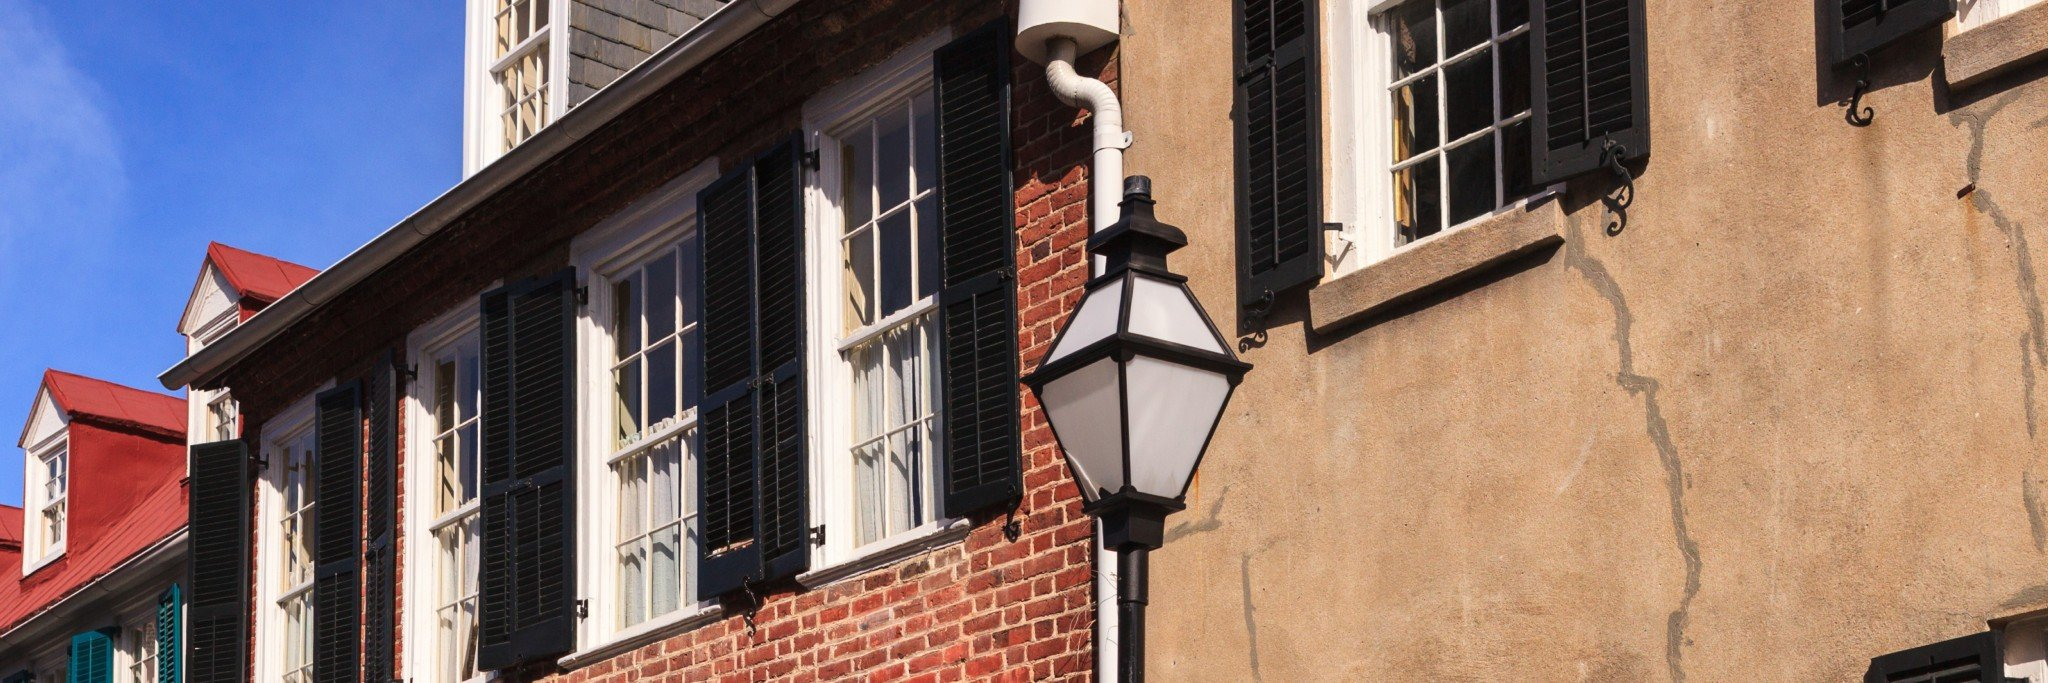 Historic Charleston Downtown Street Scene